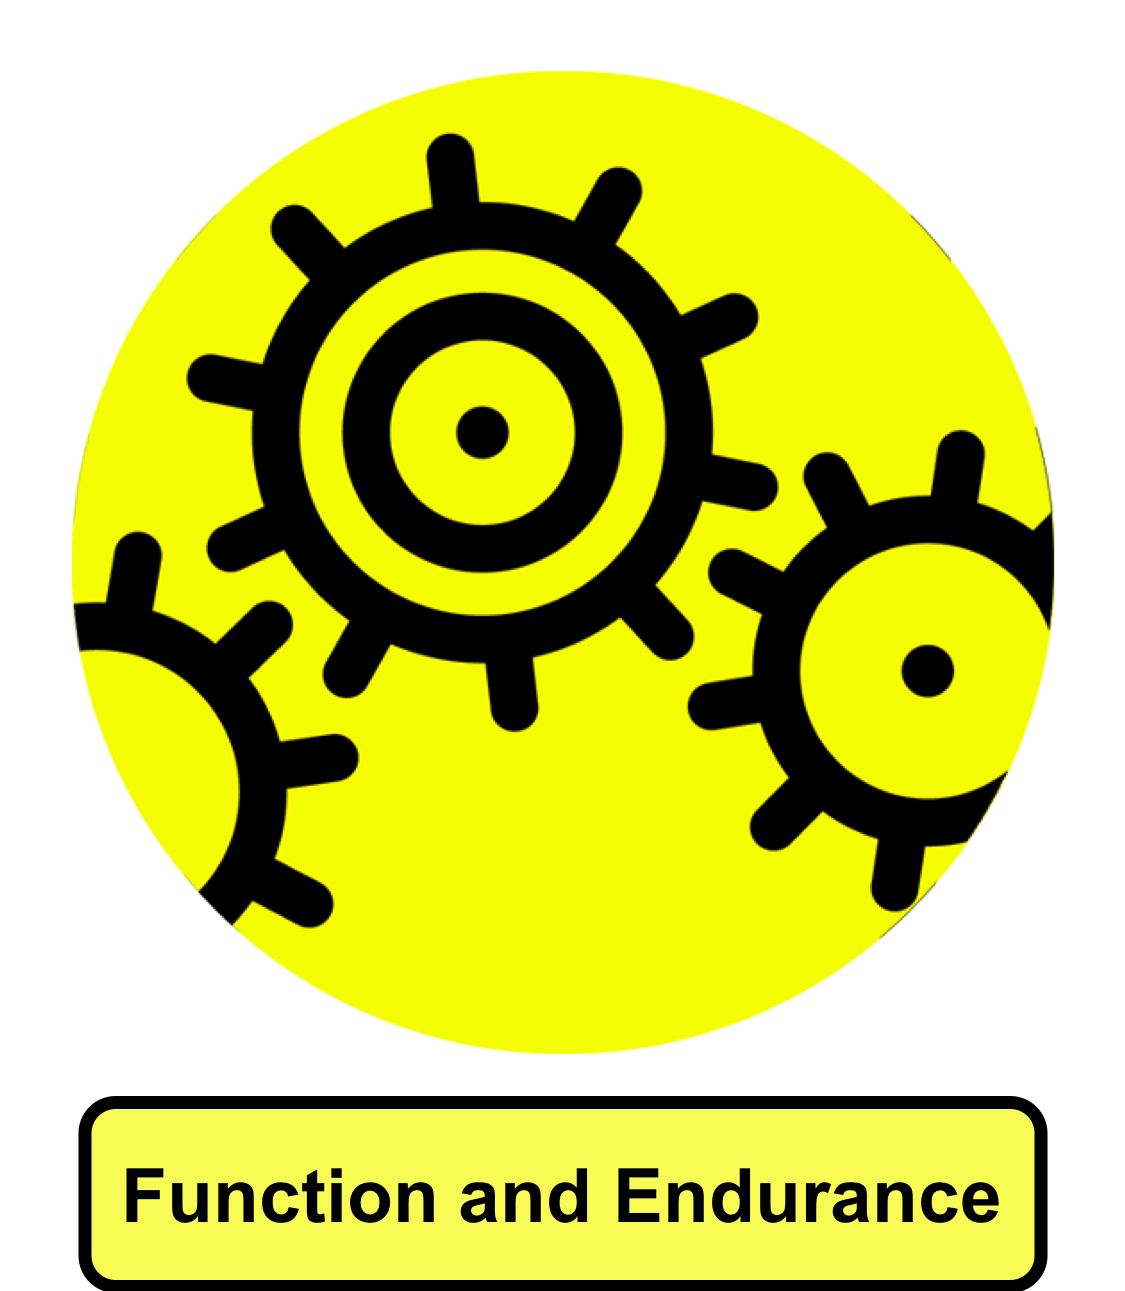 Function & Endurance